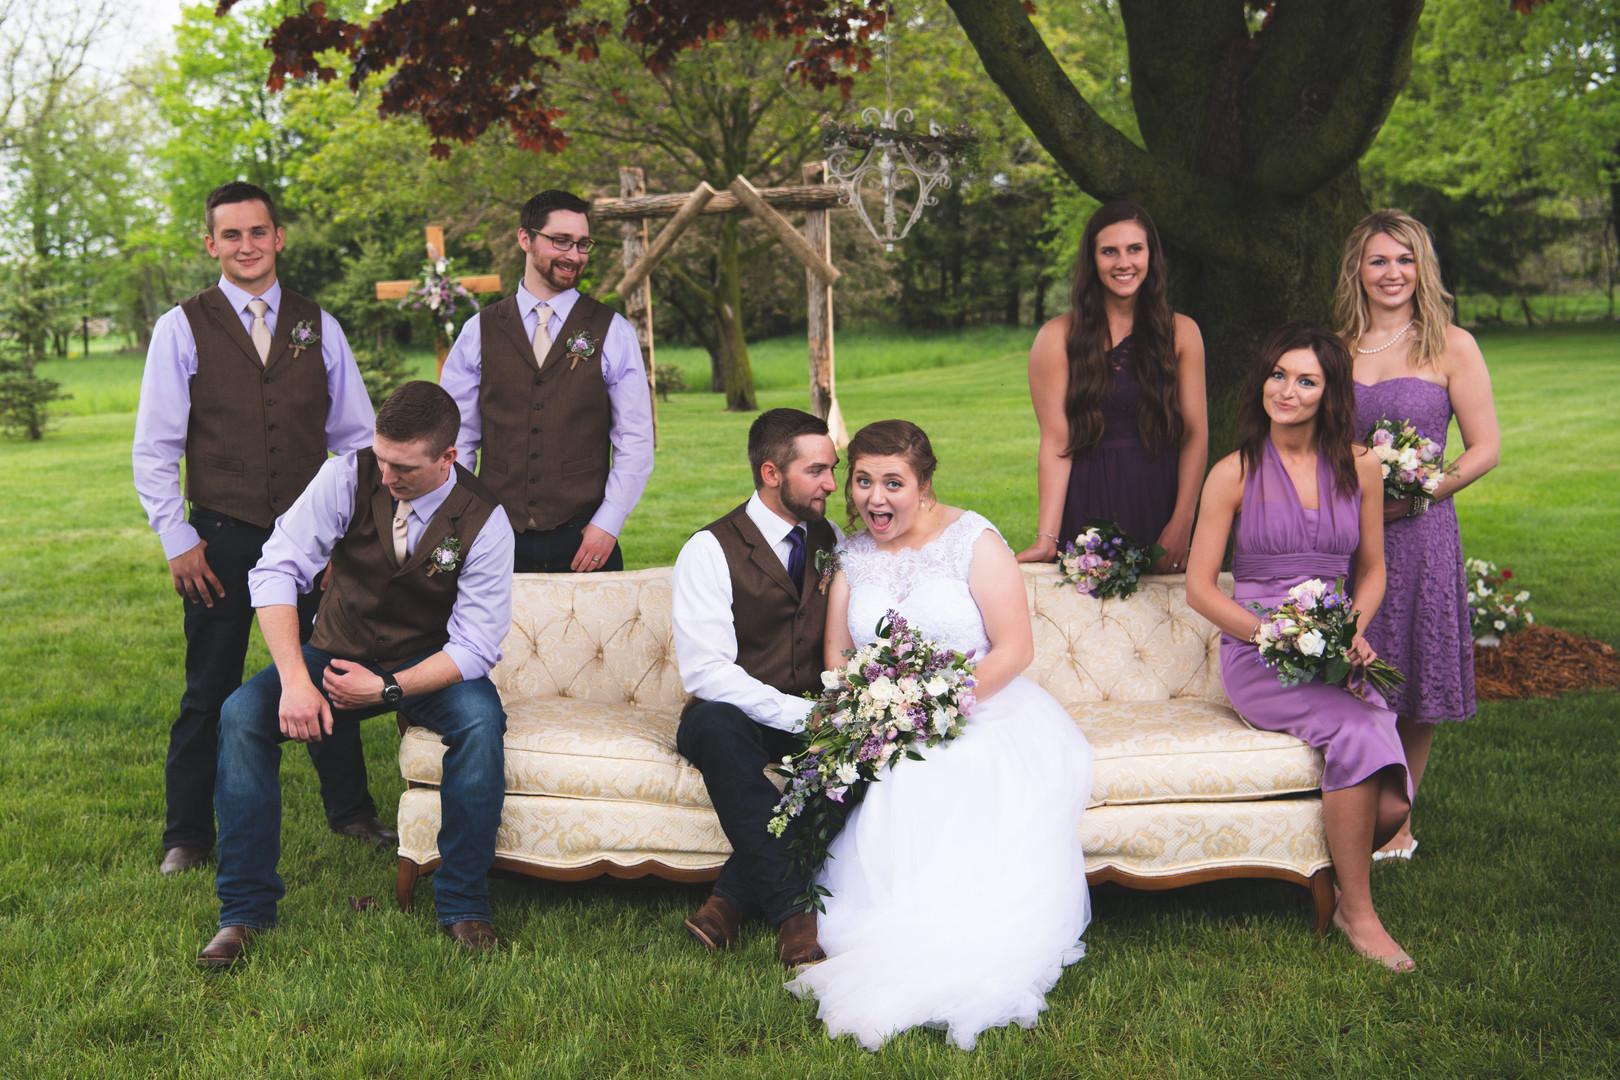 vintage wedding party photo shoot